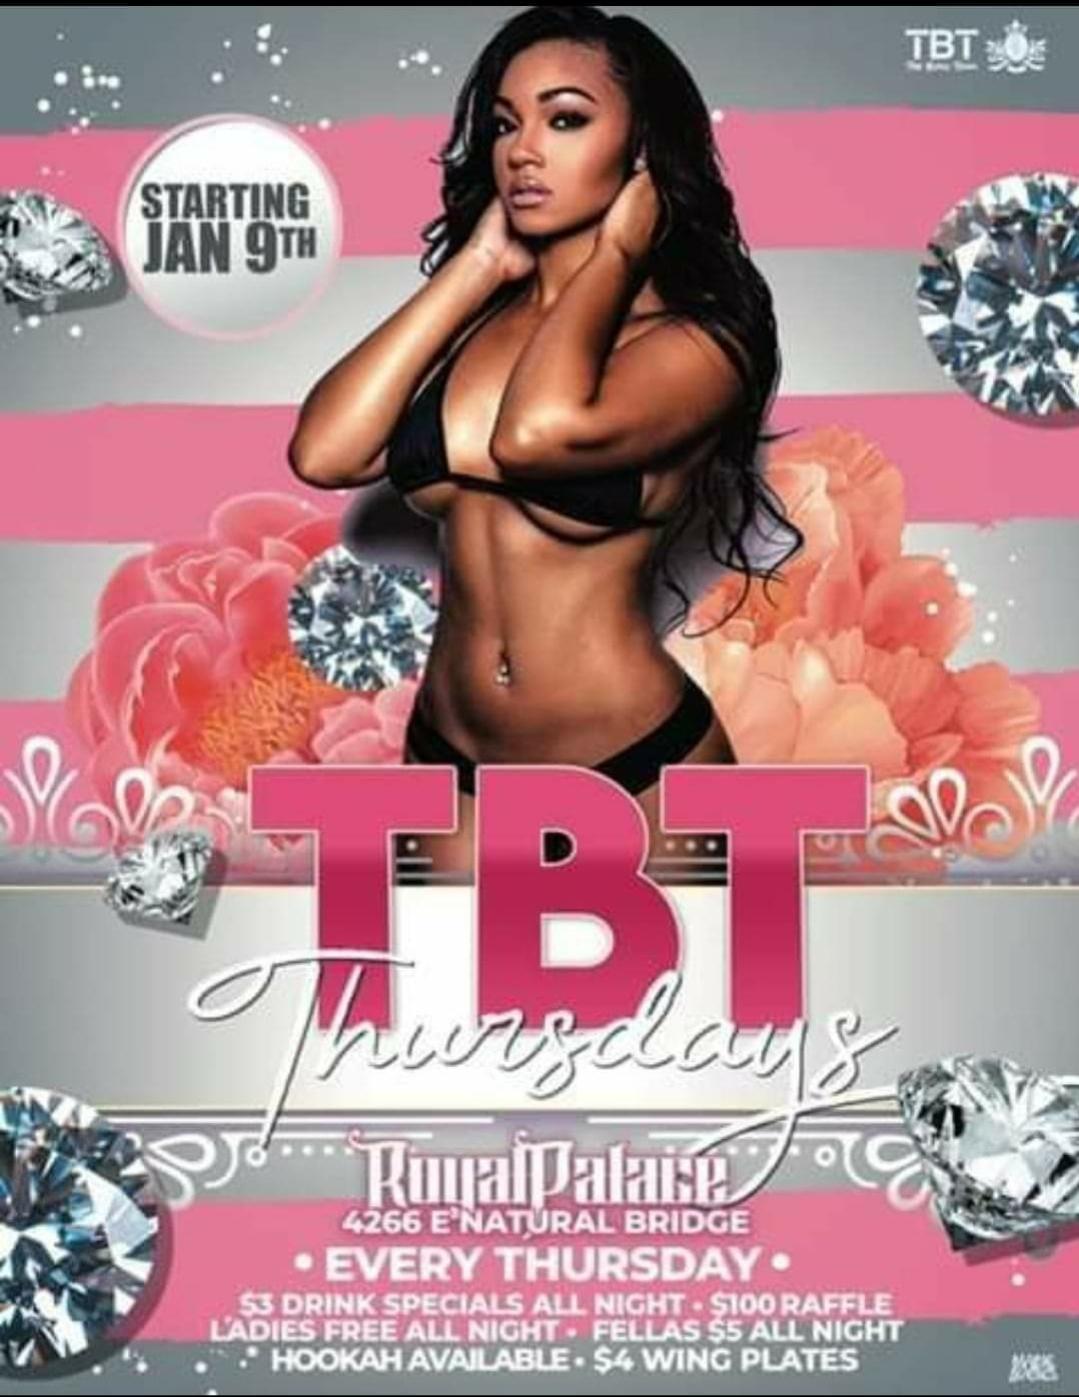 TBT Thursday's @ Royal Palace